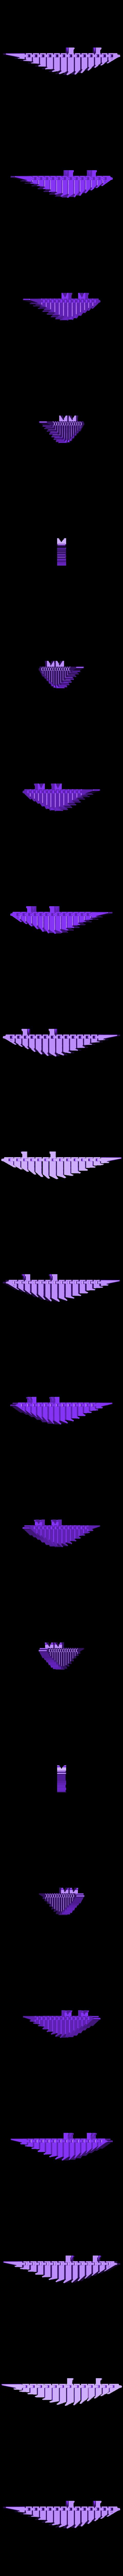 pangolins-2-tight.stl Download free STL file Twist & bendable pangolins by orangeteacher • 3D printable design, orangeteacher